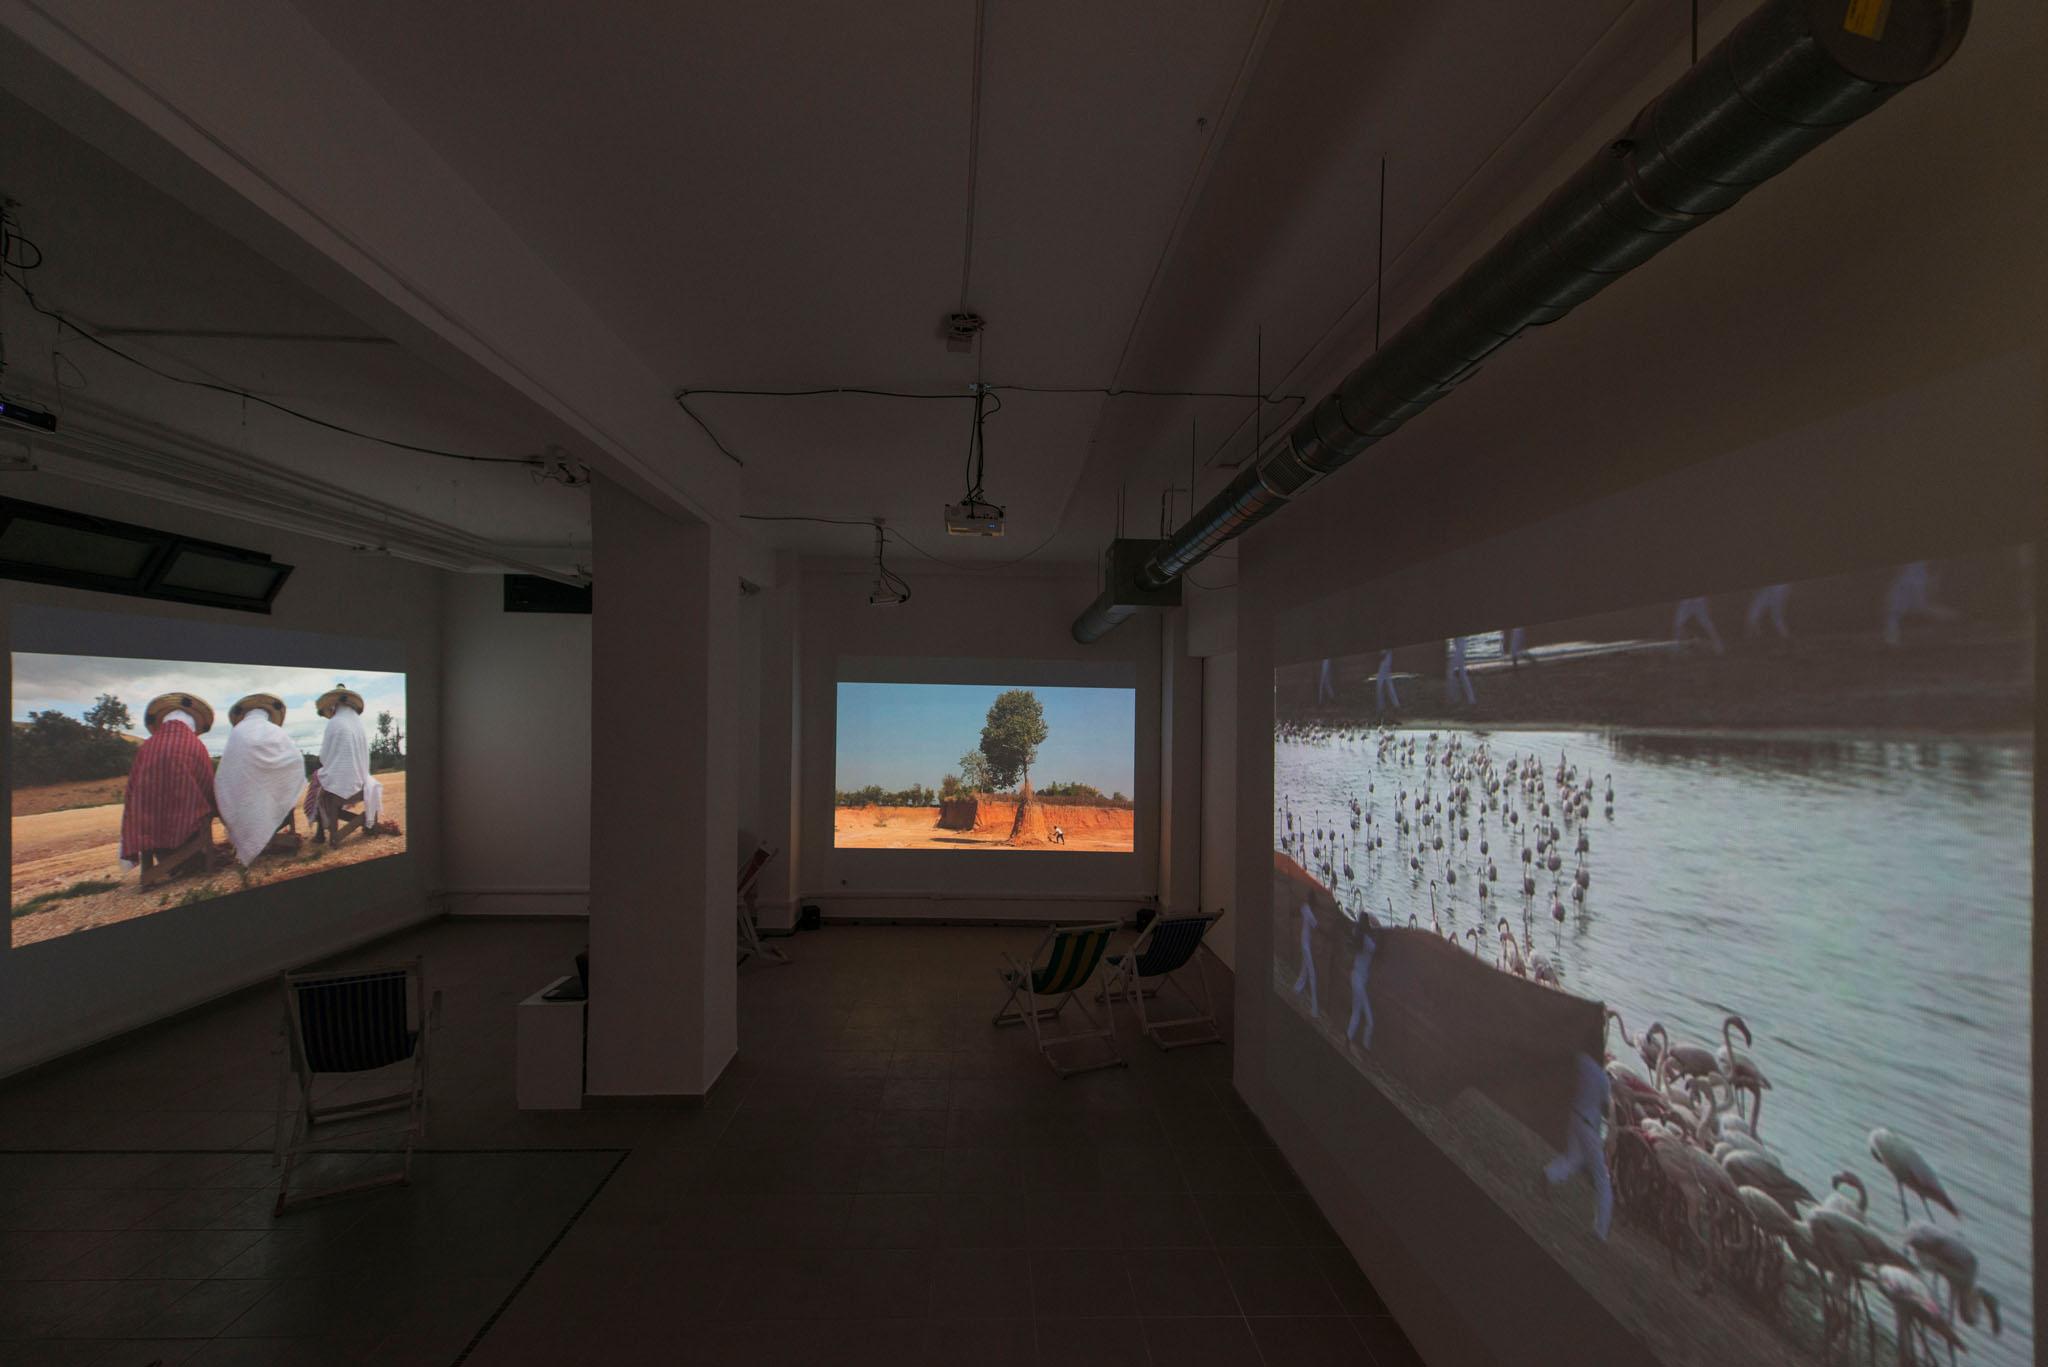 Bertille Bak, Usine à divertissement, 2016, trittico video, 20 min, ed. 6+1AP, produzione per BIM Genève 2016, exhibtion view at The Gallery Apart Roma, photo Giorgio Benni